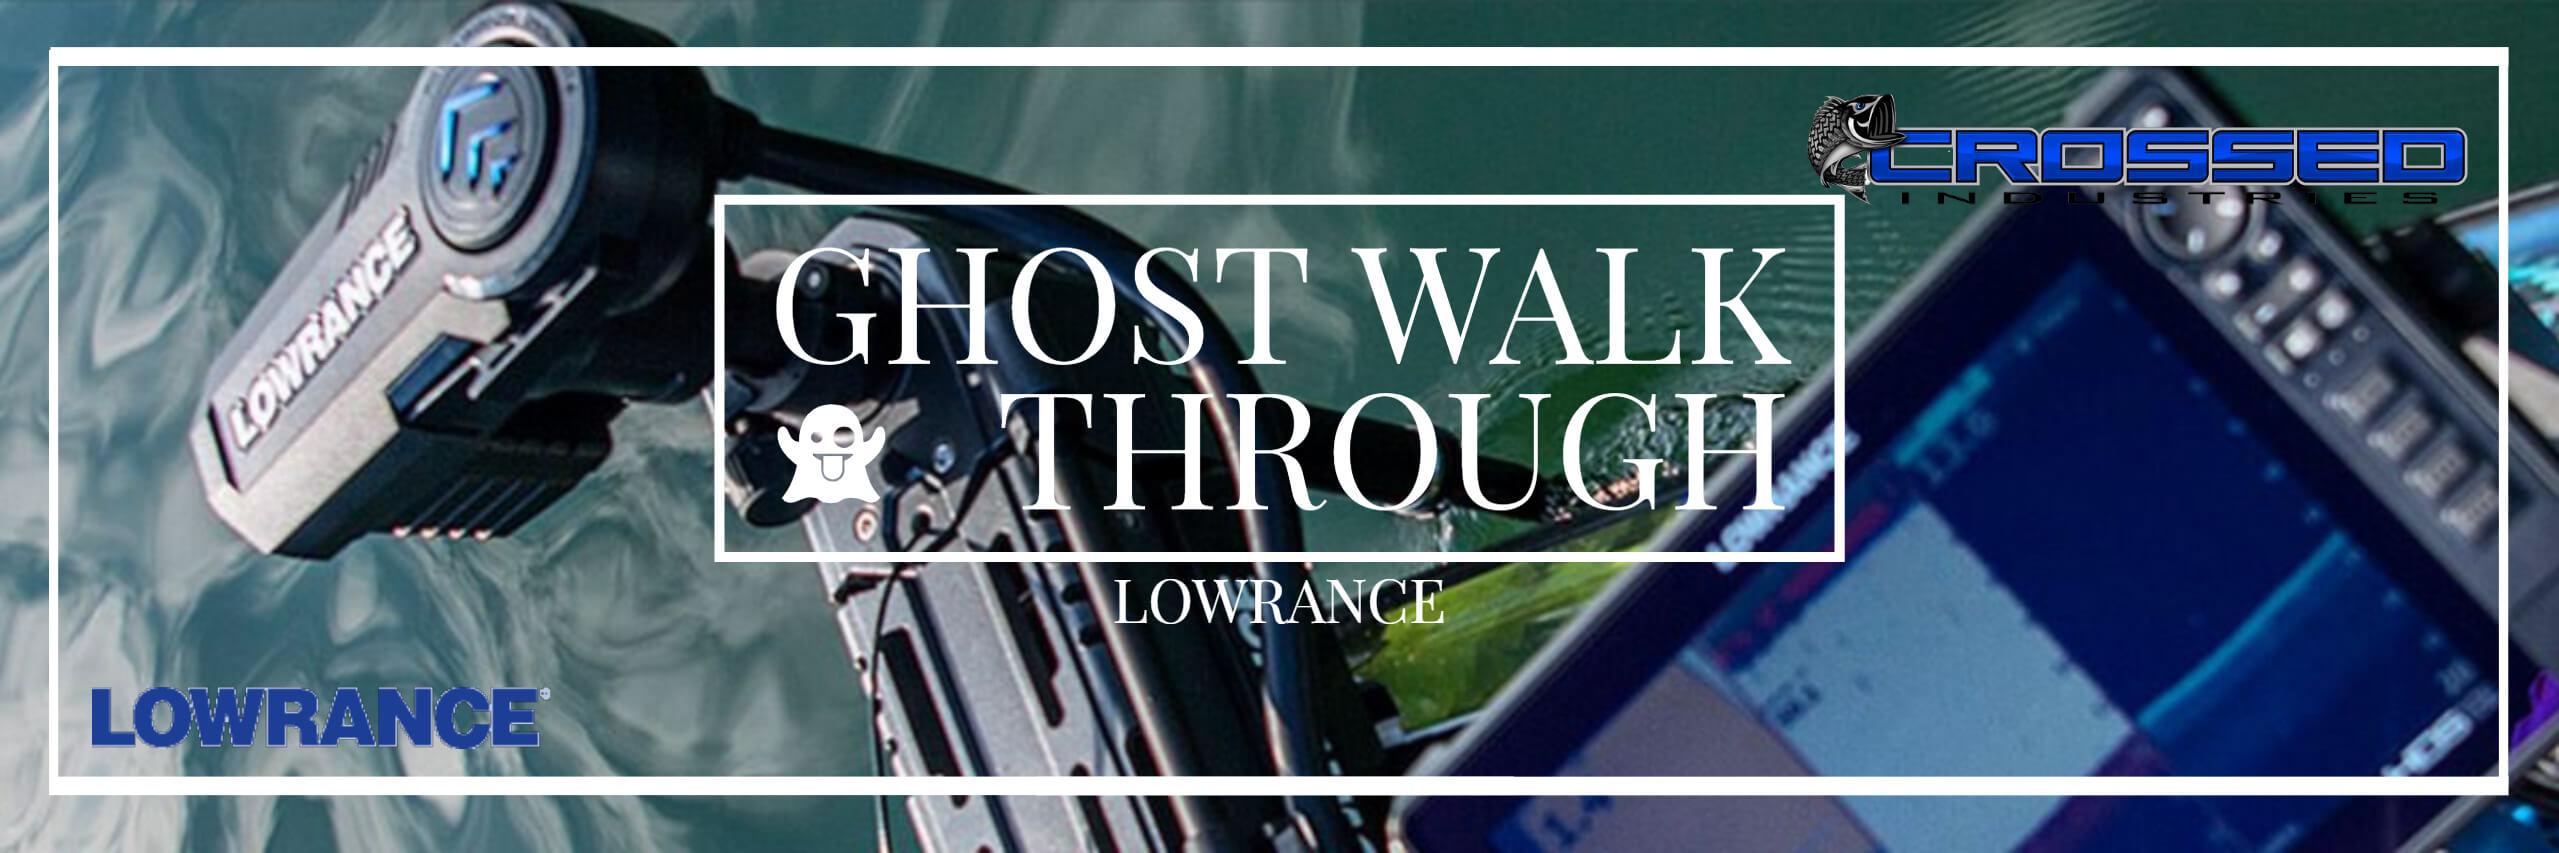 Ghost Walk Through - Lowrance